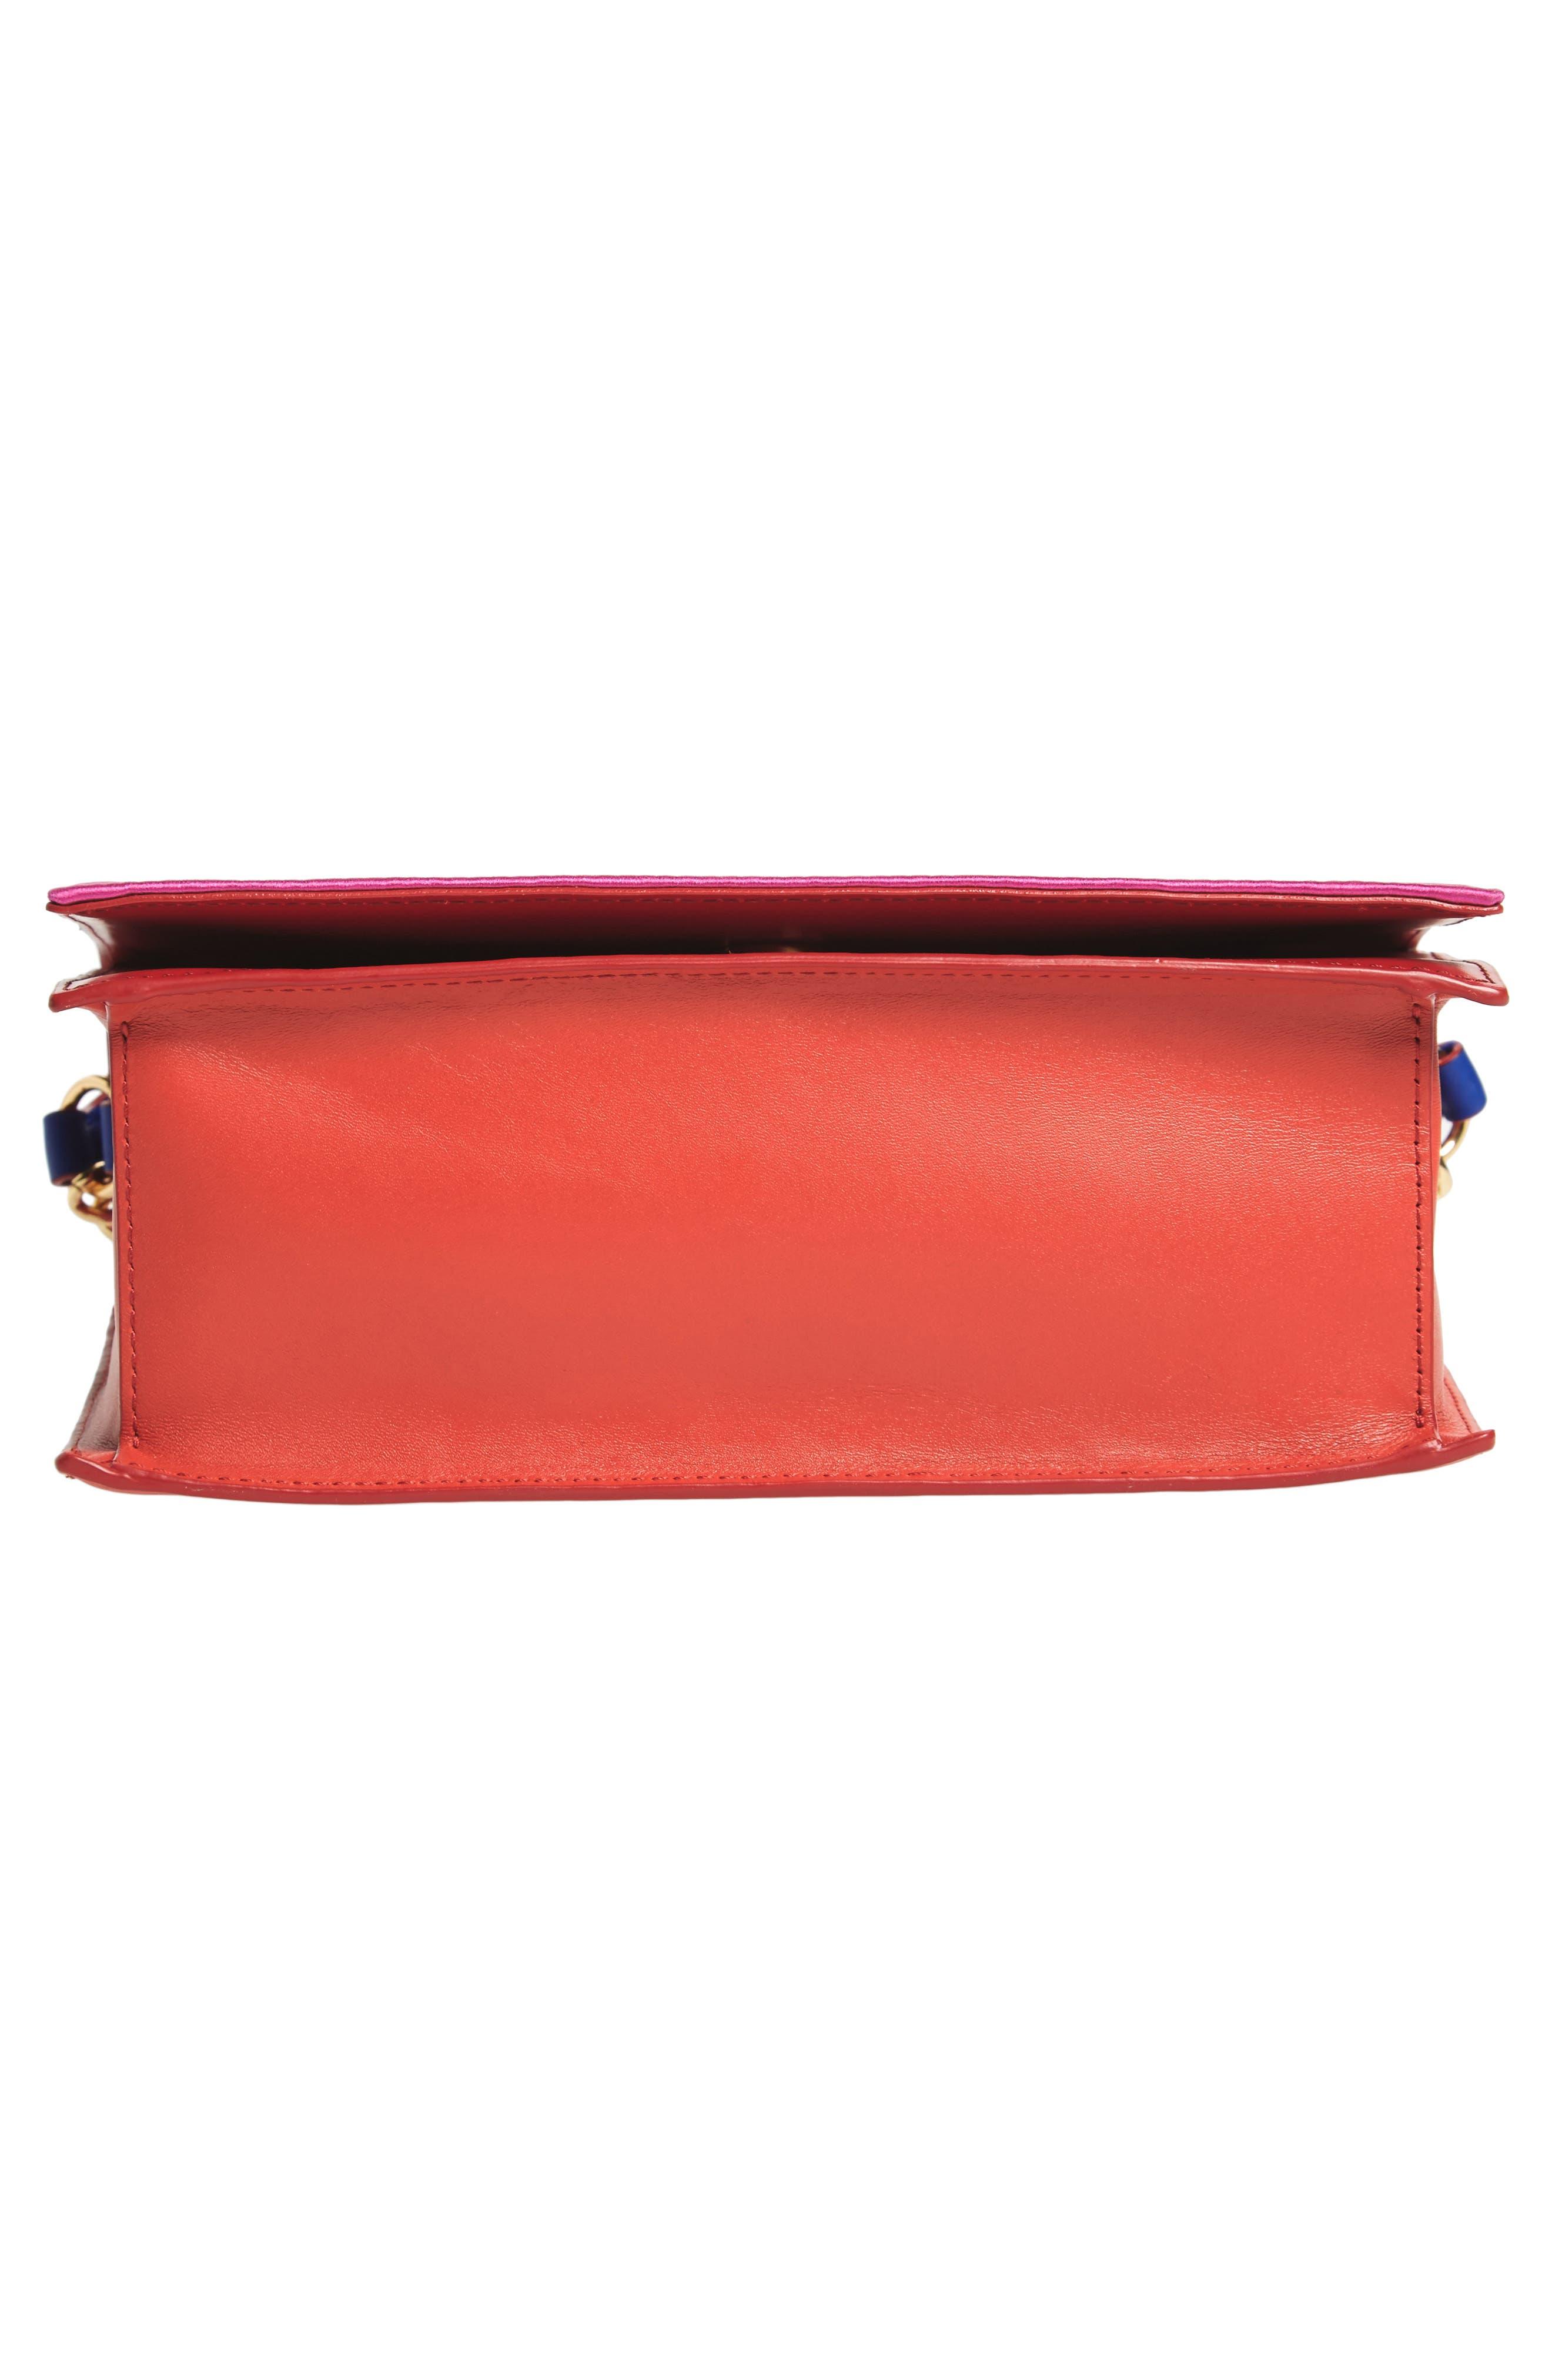 Soirée Satin & Leather Top Handle Bag,                             Alternate thumbnail 6, color,                             Pink